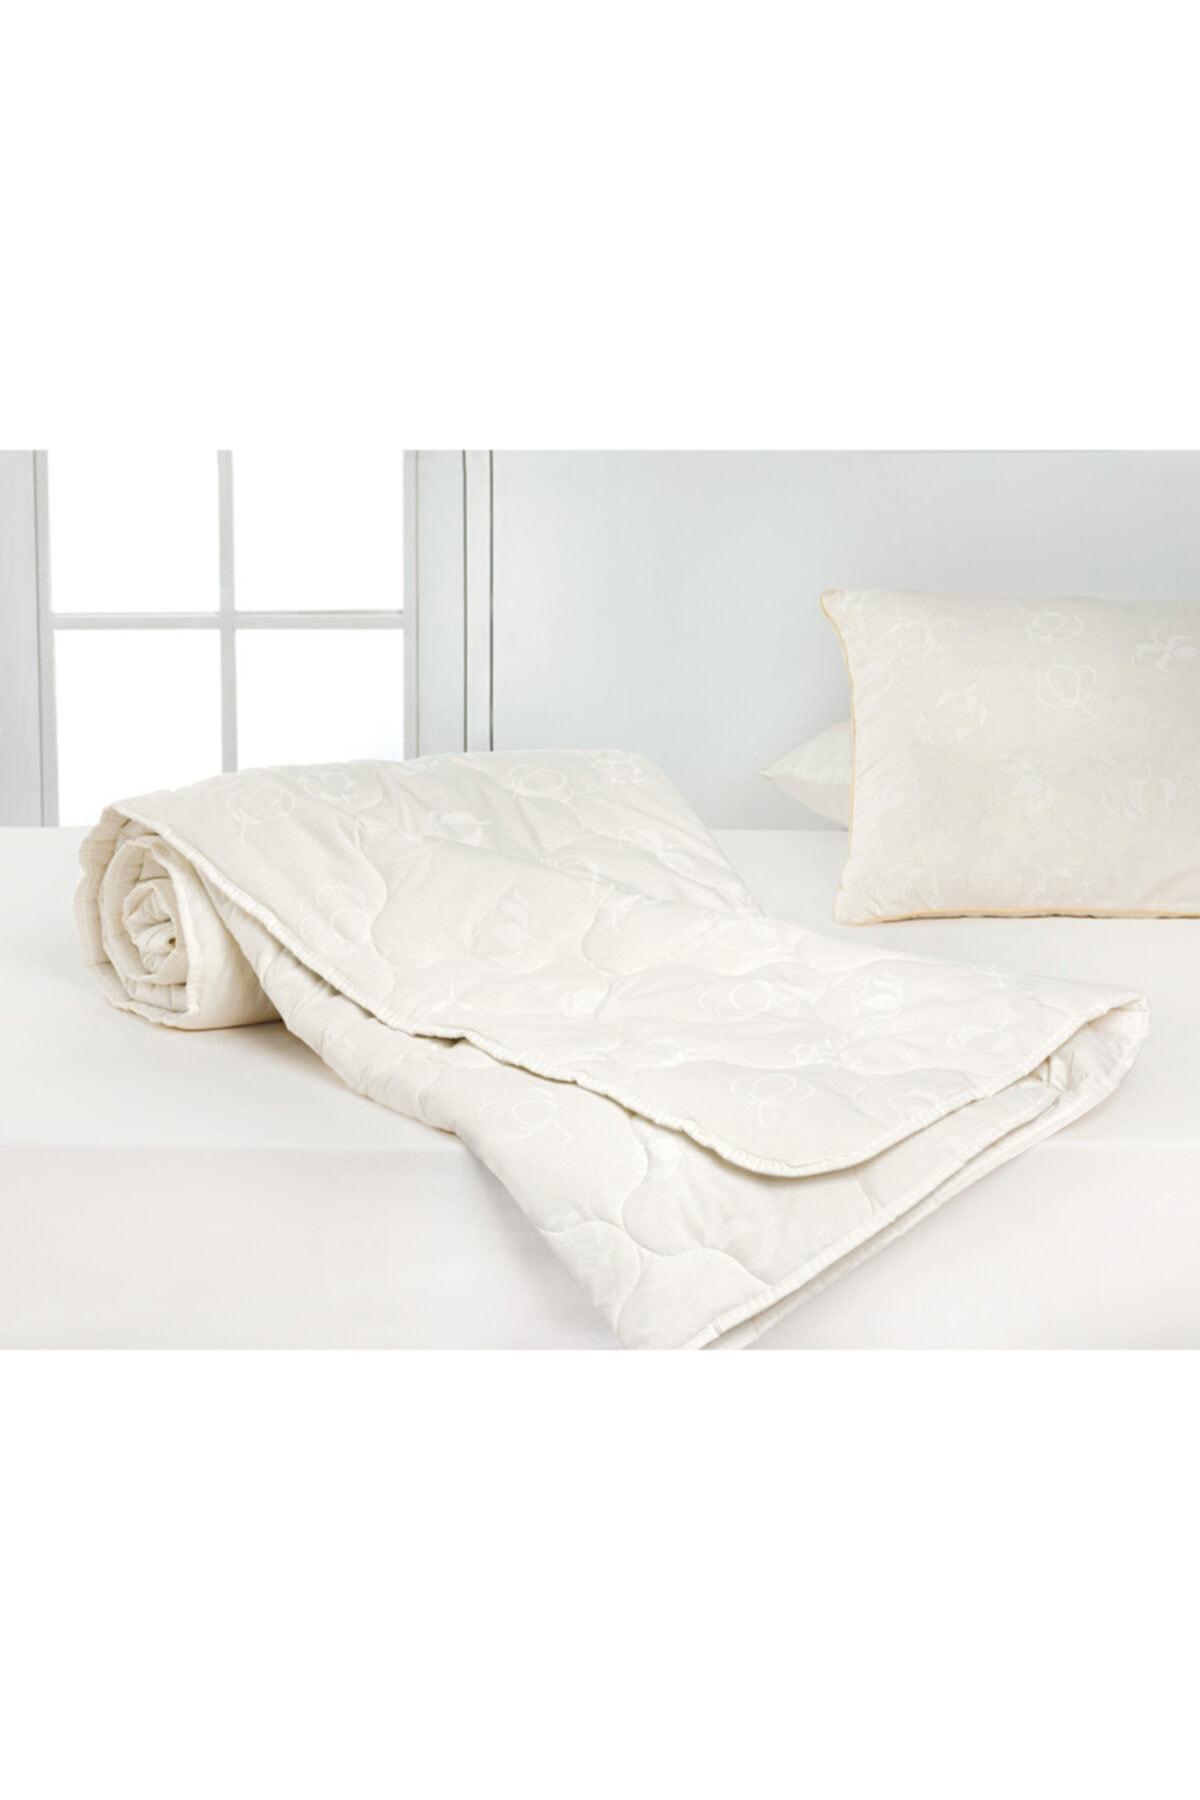 English Home Comfy Pamuk Çift Kişilik Yorgan 195X215 Cm Beyaz 2